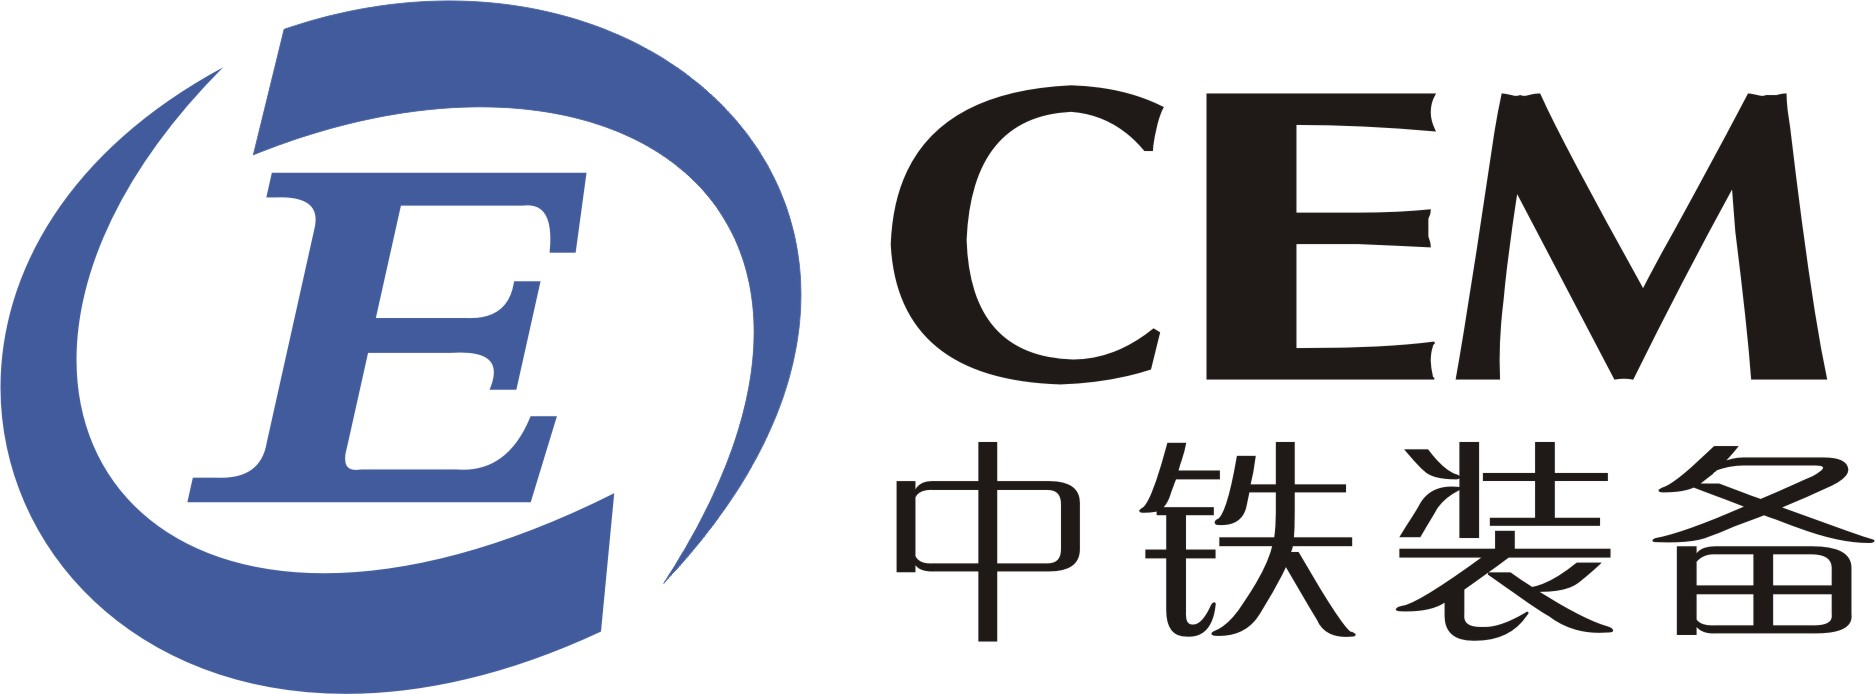 logo logo 标识 标志 设计 矢量 矢量图 素材 图标 1875_694